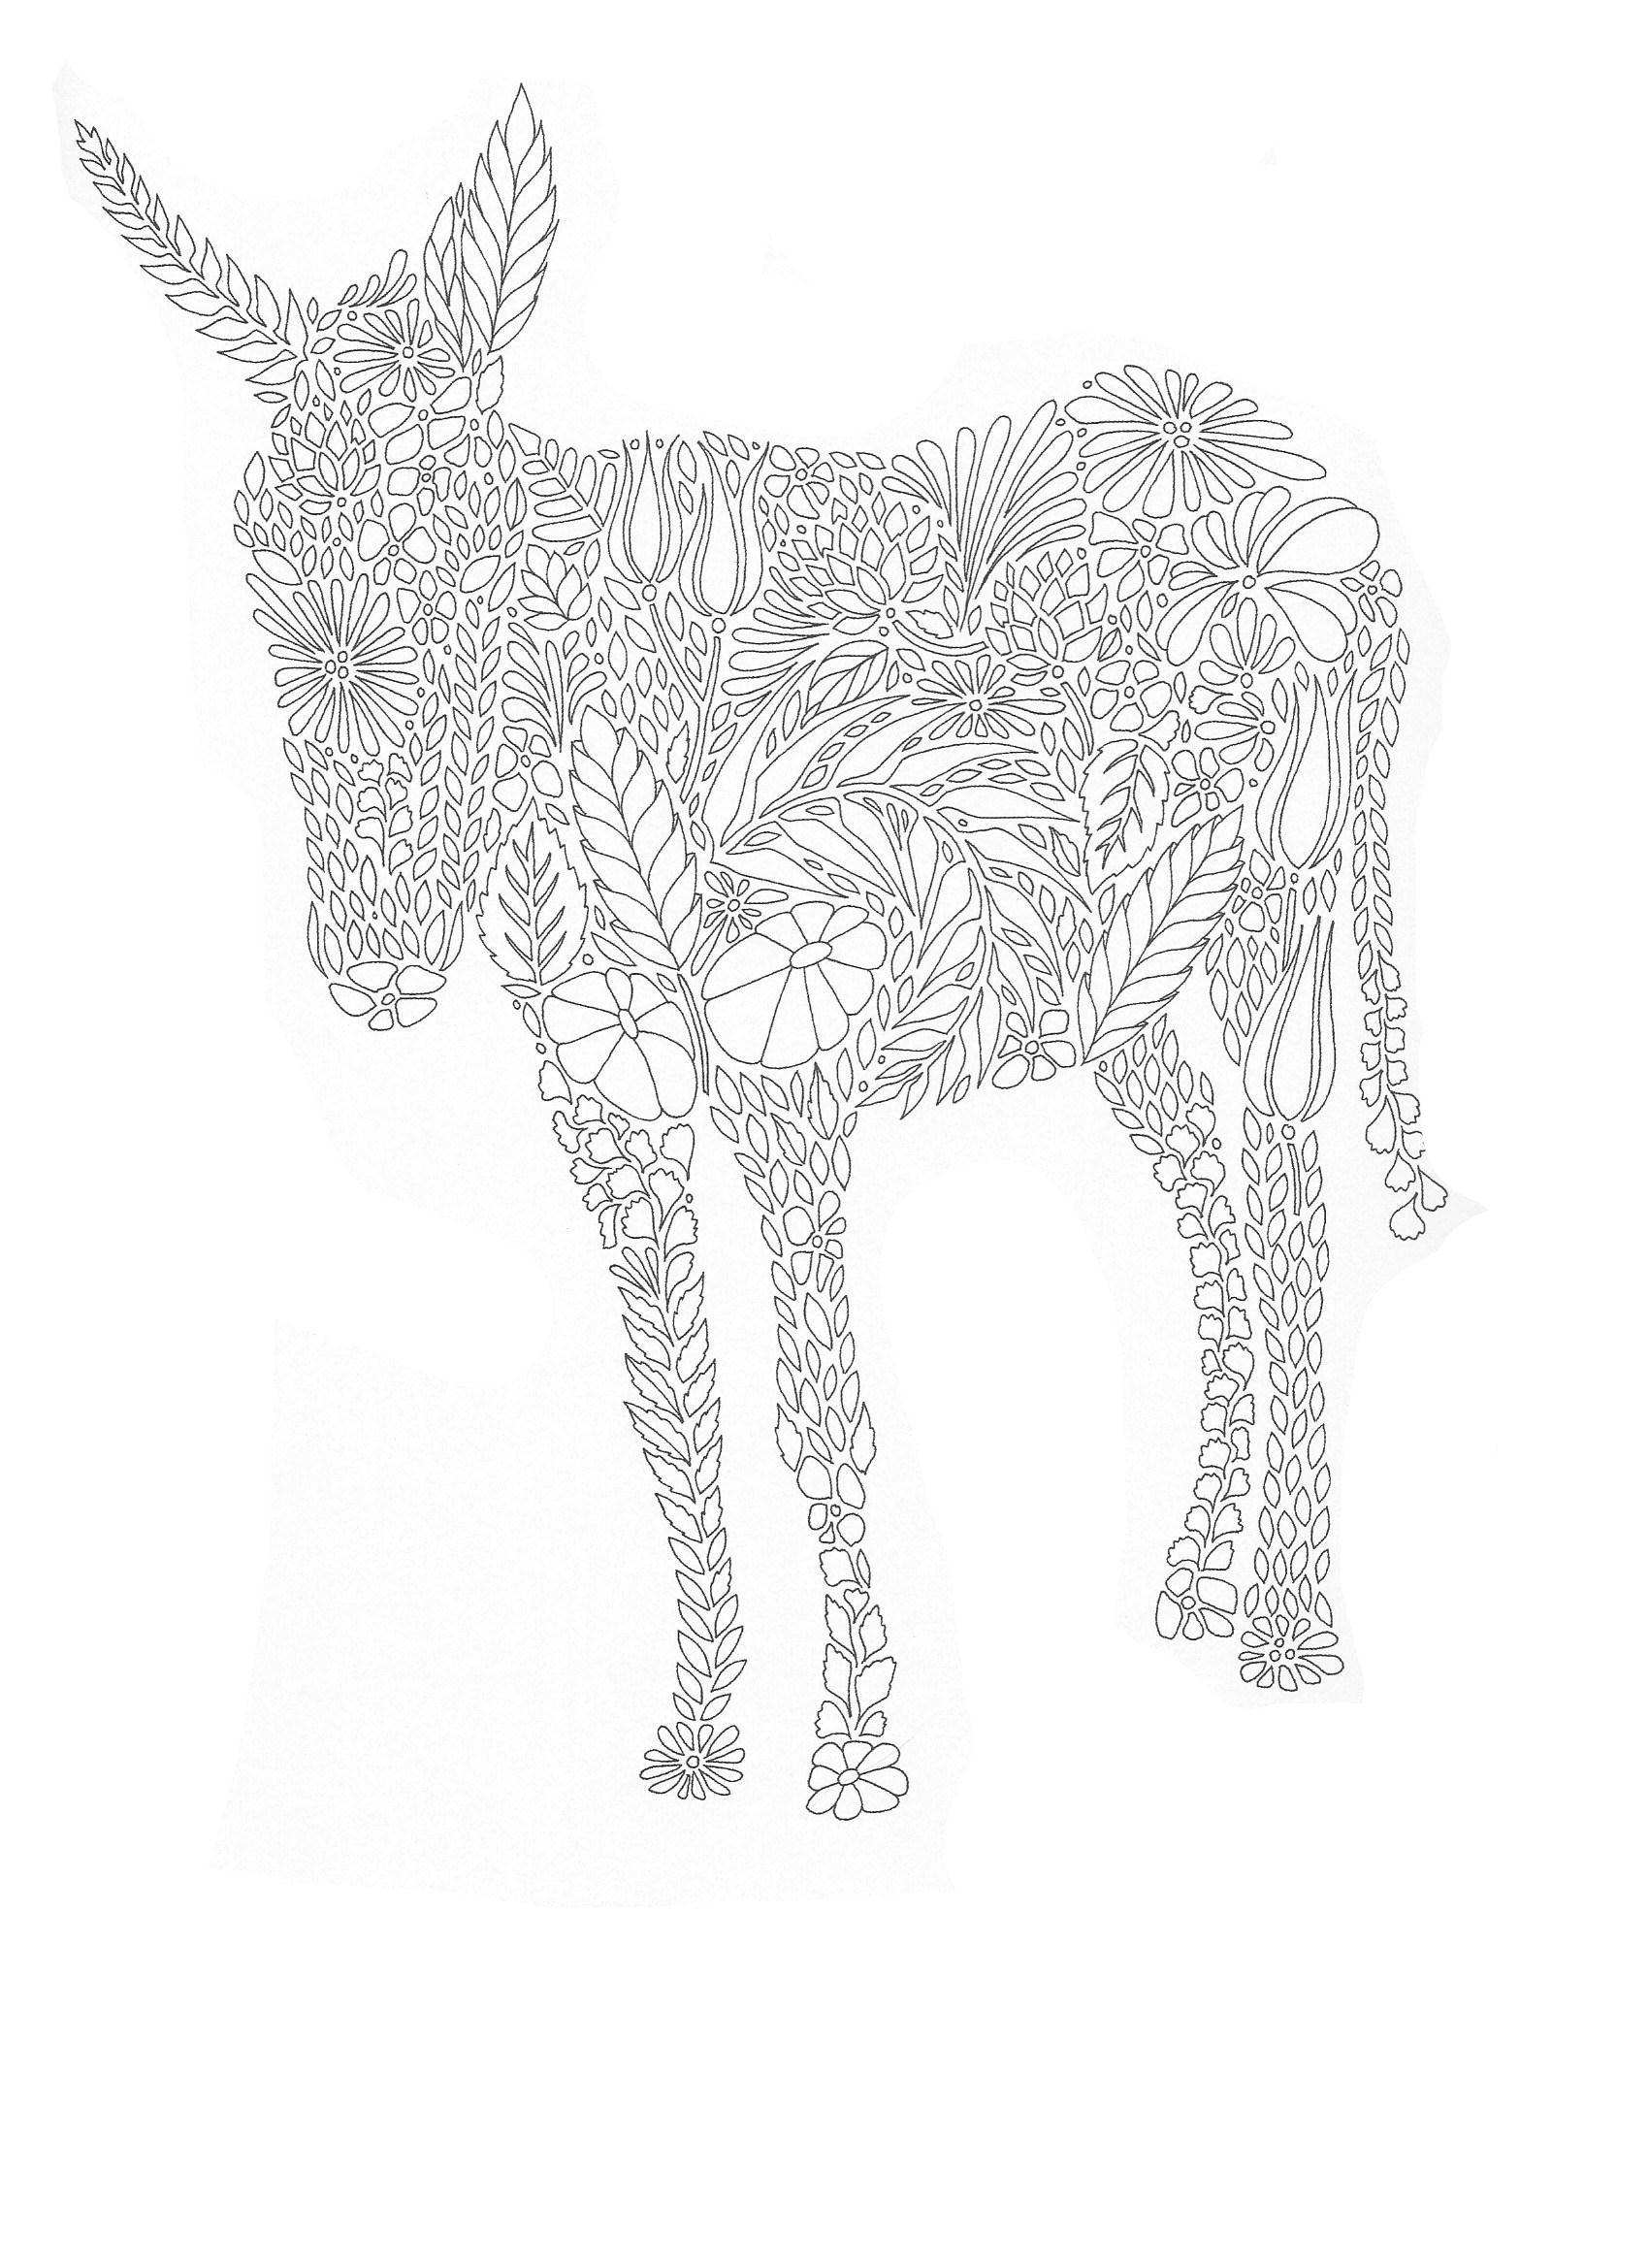 Fantastic Animals Donkey Millie Marotta Coloring Book Animal Coloring Pages Animal Coloring Books